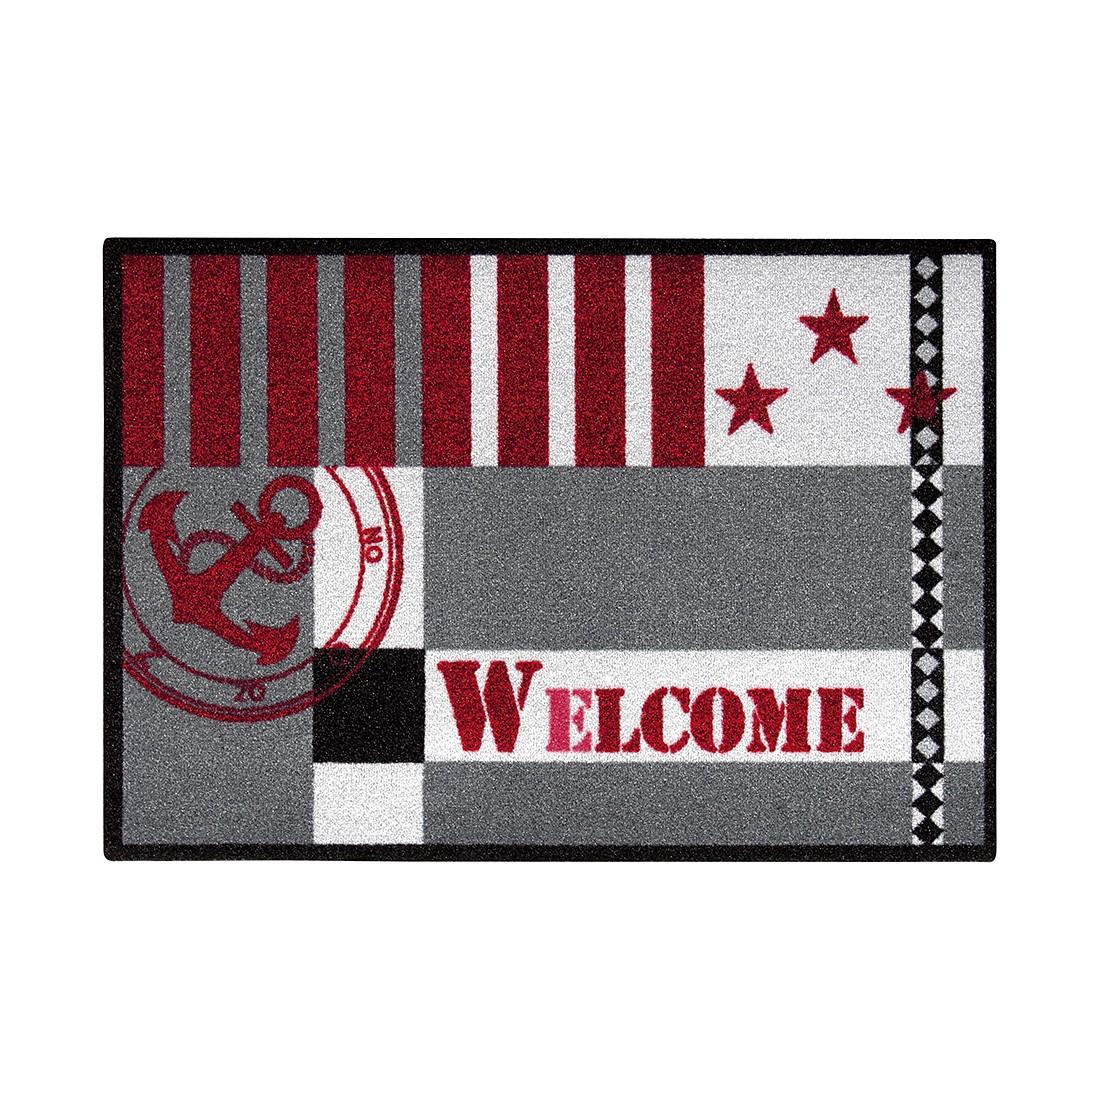 Fussmatte Metropolitan Welcome Marine | Heimtextilien > Fussmatten | Schwarz | Textil | andiamo